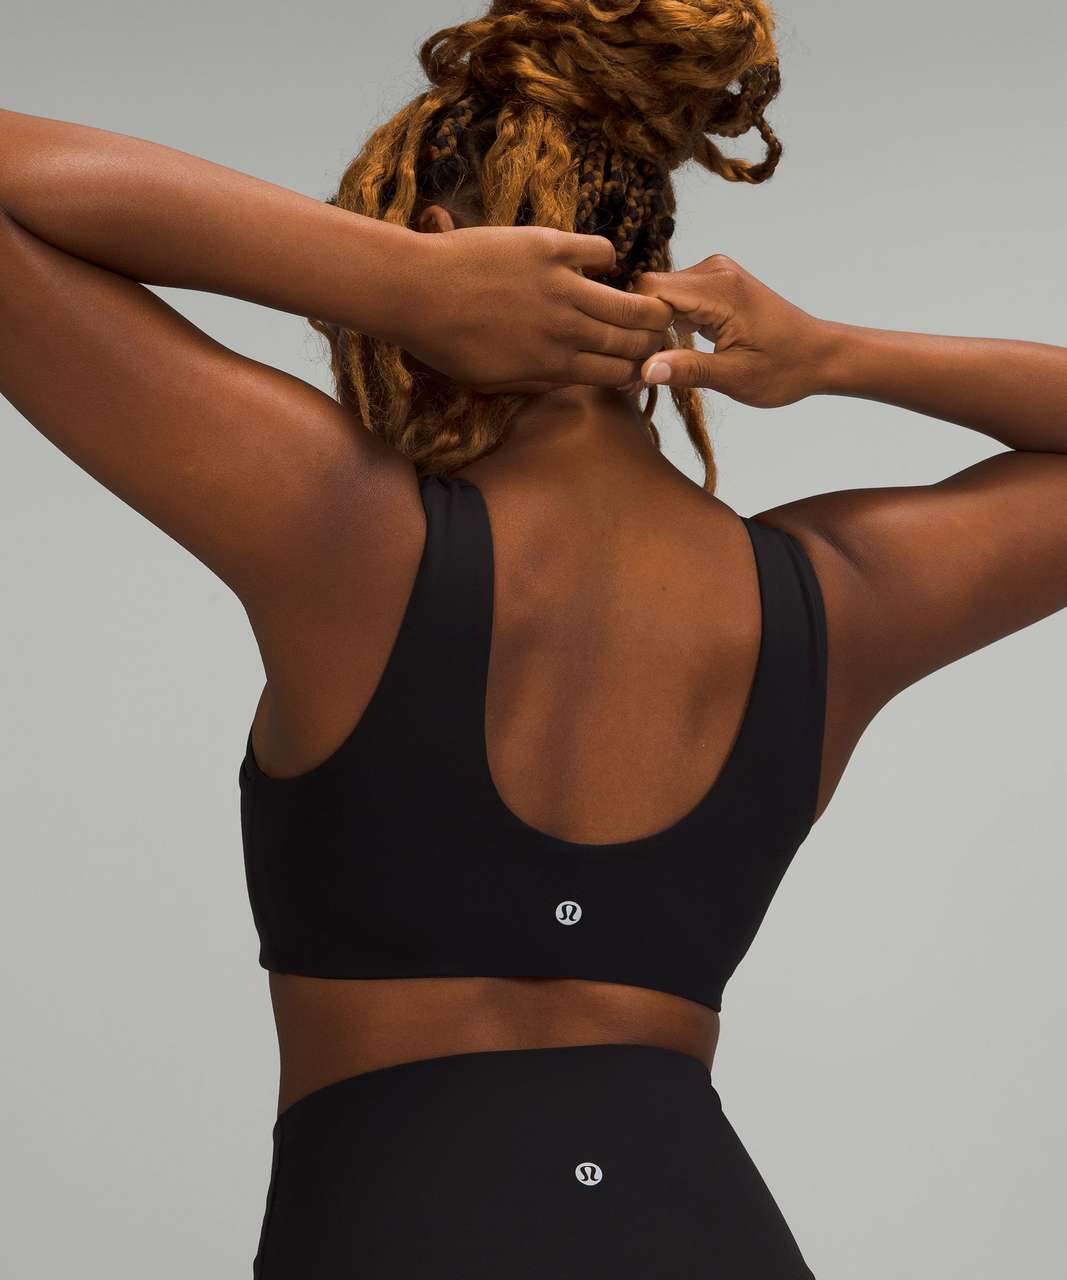 Lululemon Nulu Cross-Front Yoga Bra *Light Support, B/C Cups - Black